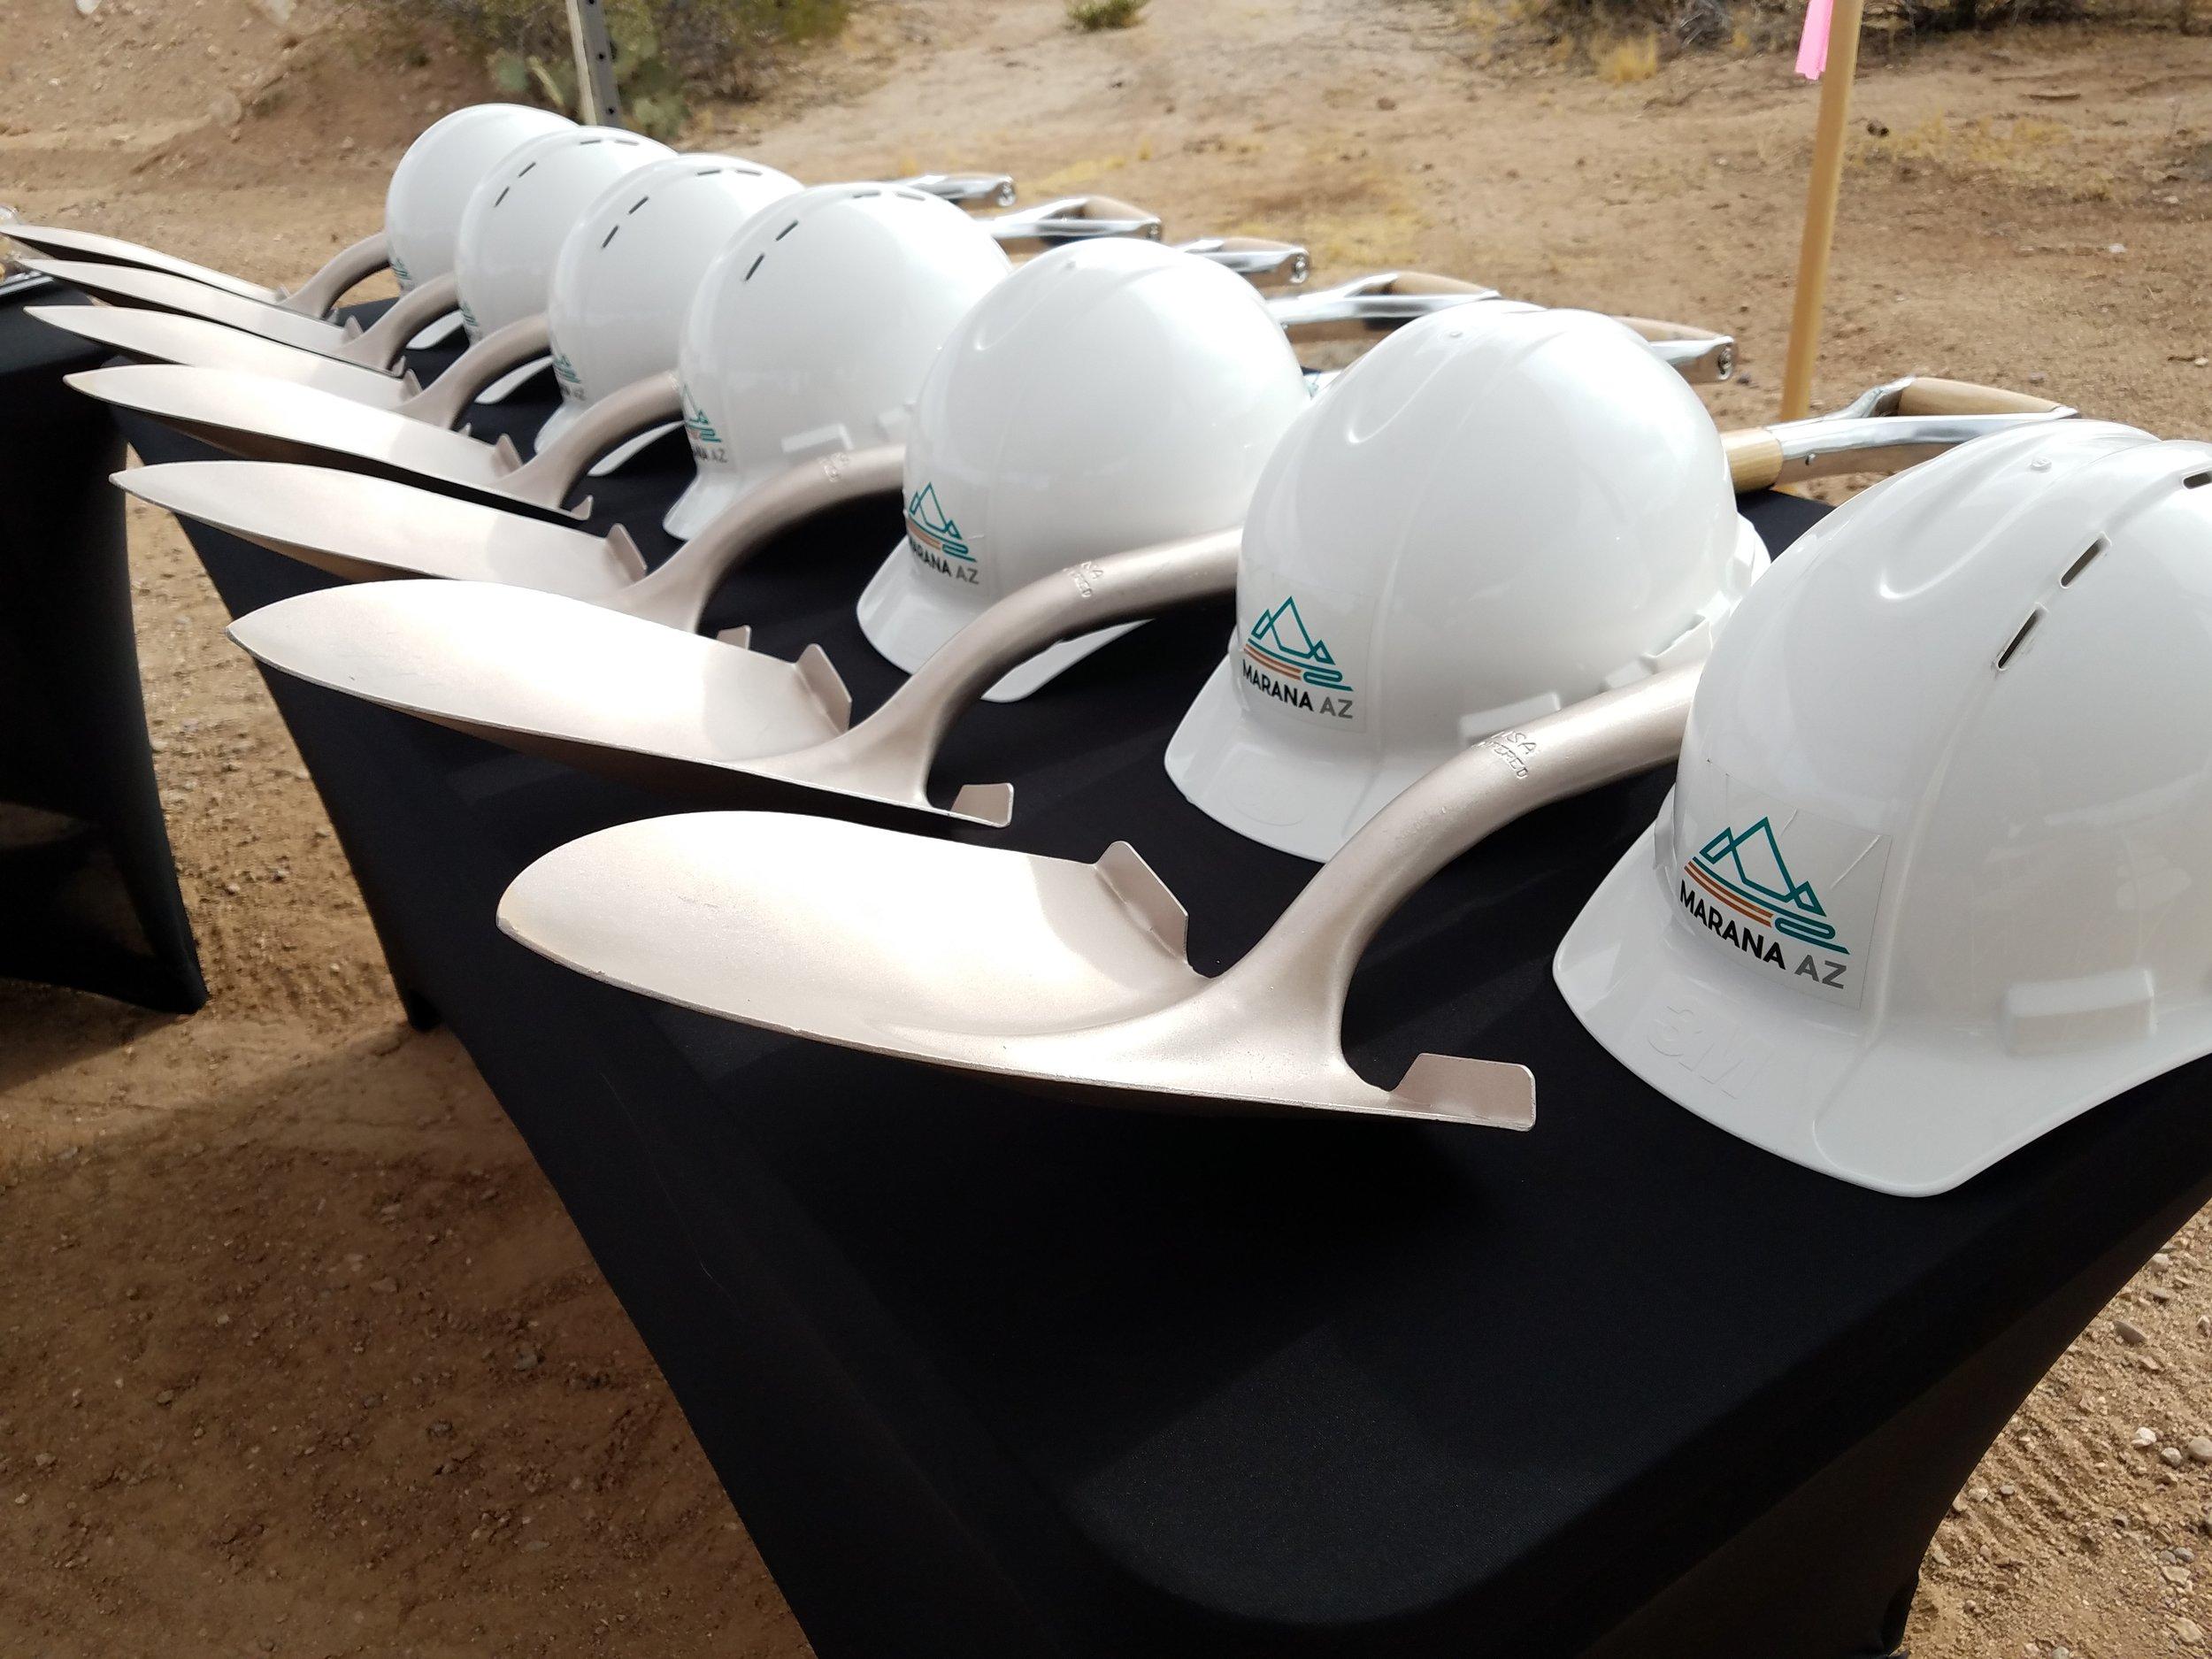 Ceremonial shovels and hard hats